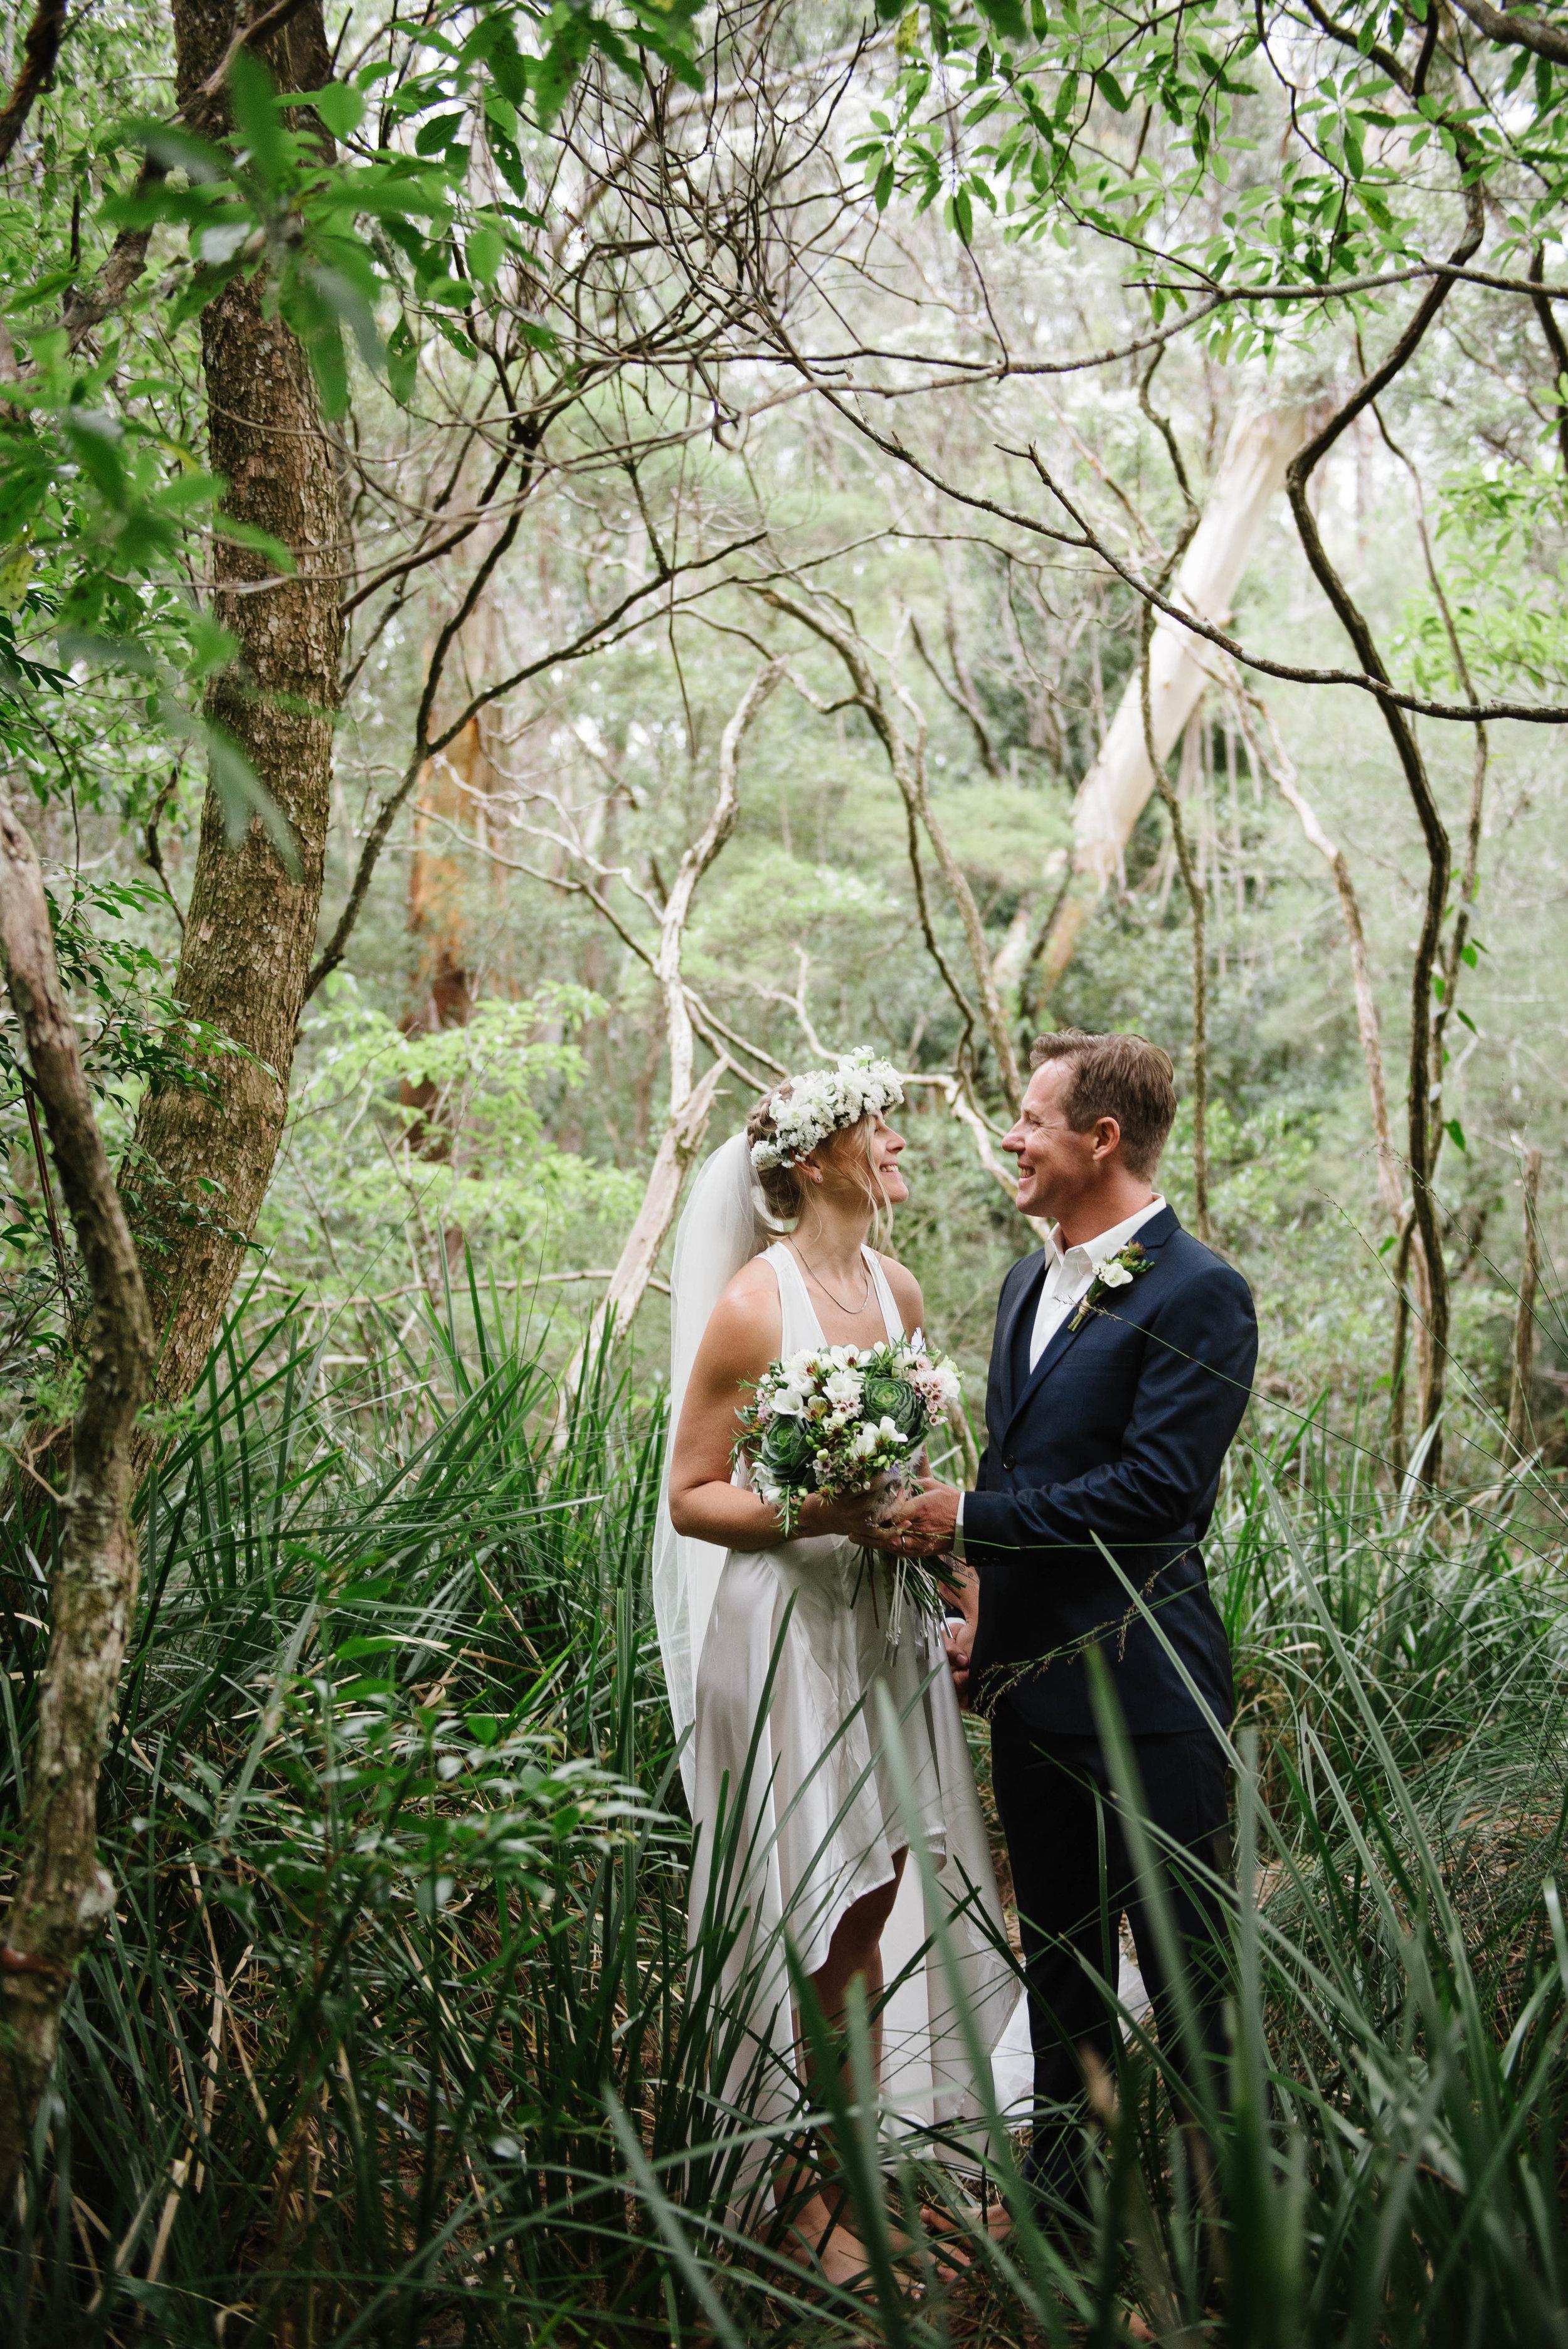 Carla and Luke- wedding photographer, byron bay wedding and family photographer, tweed heads wedding and family photography-319.jpg